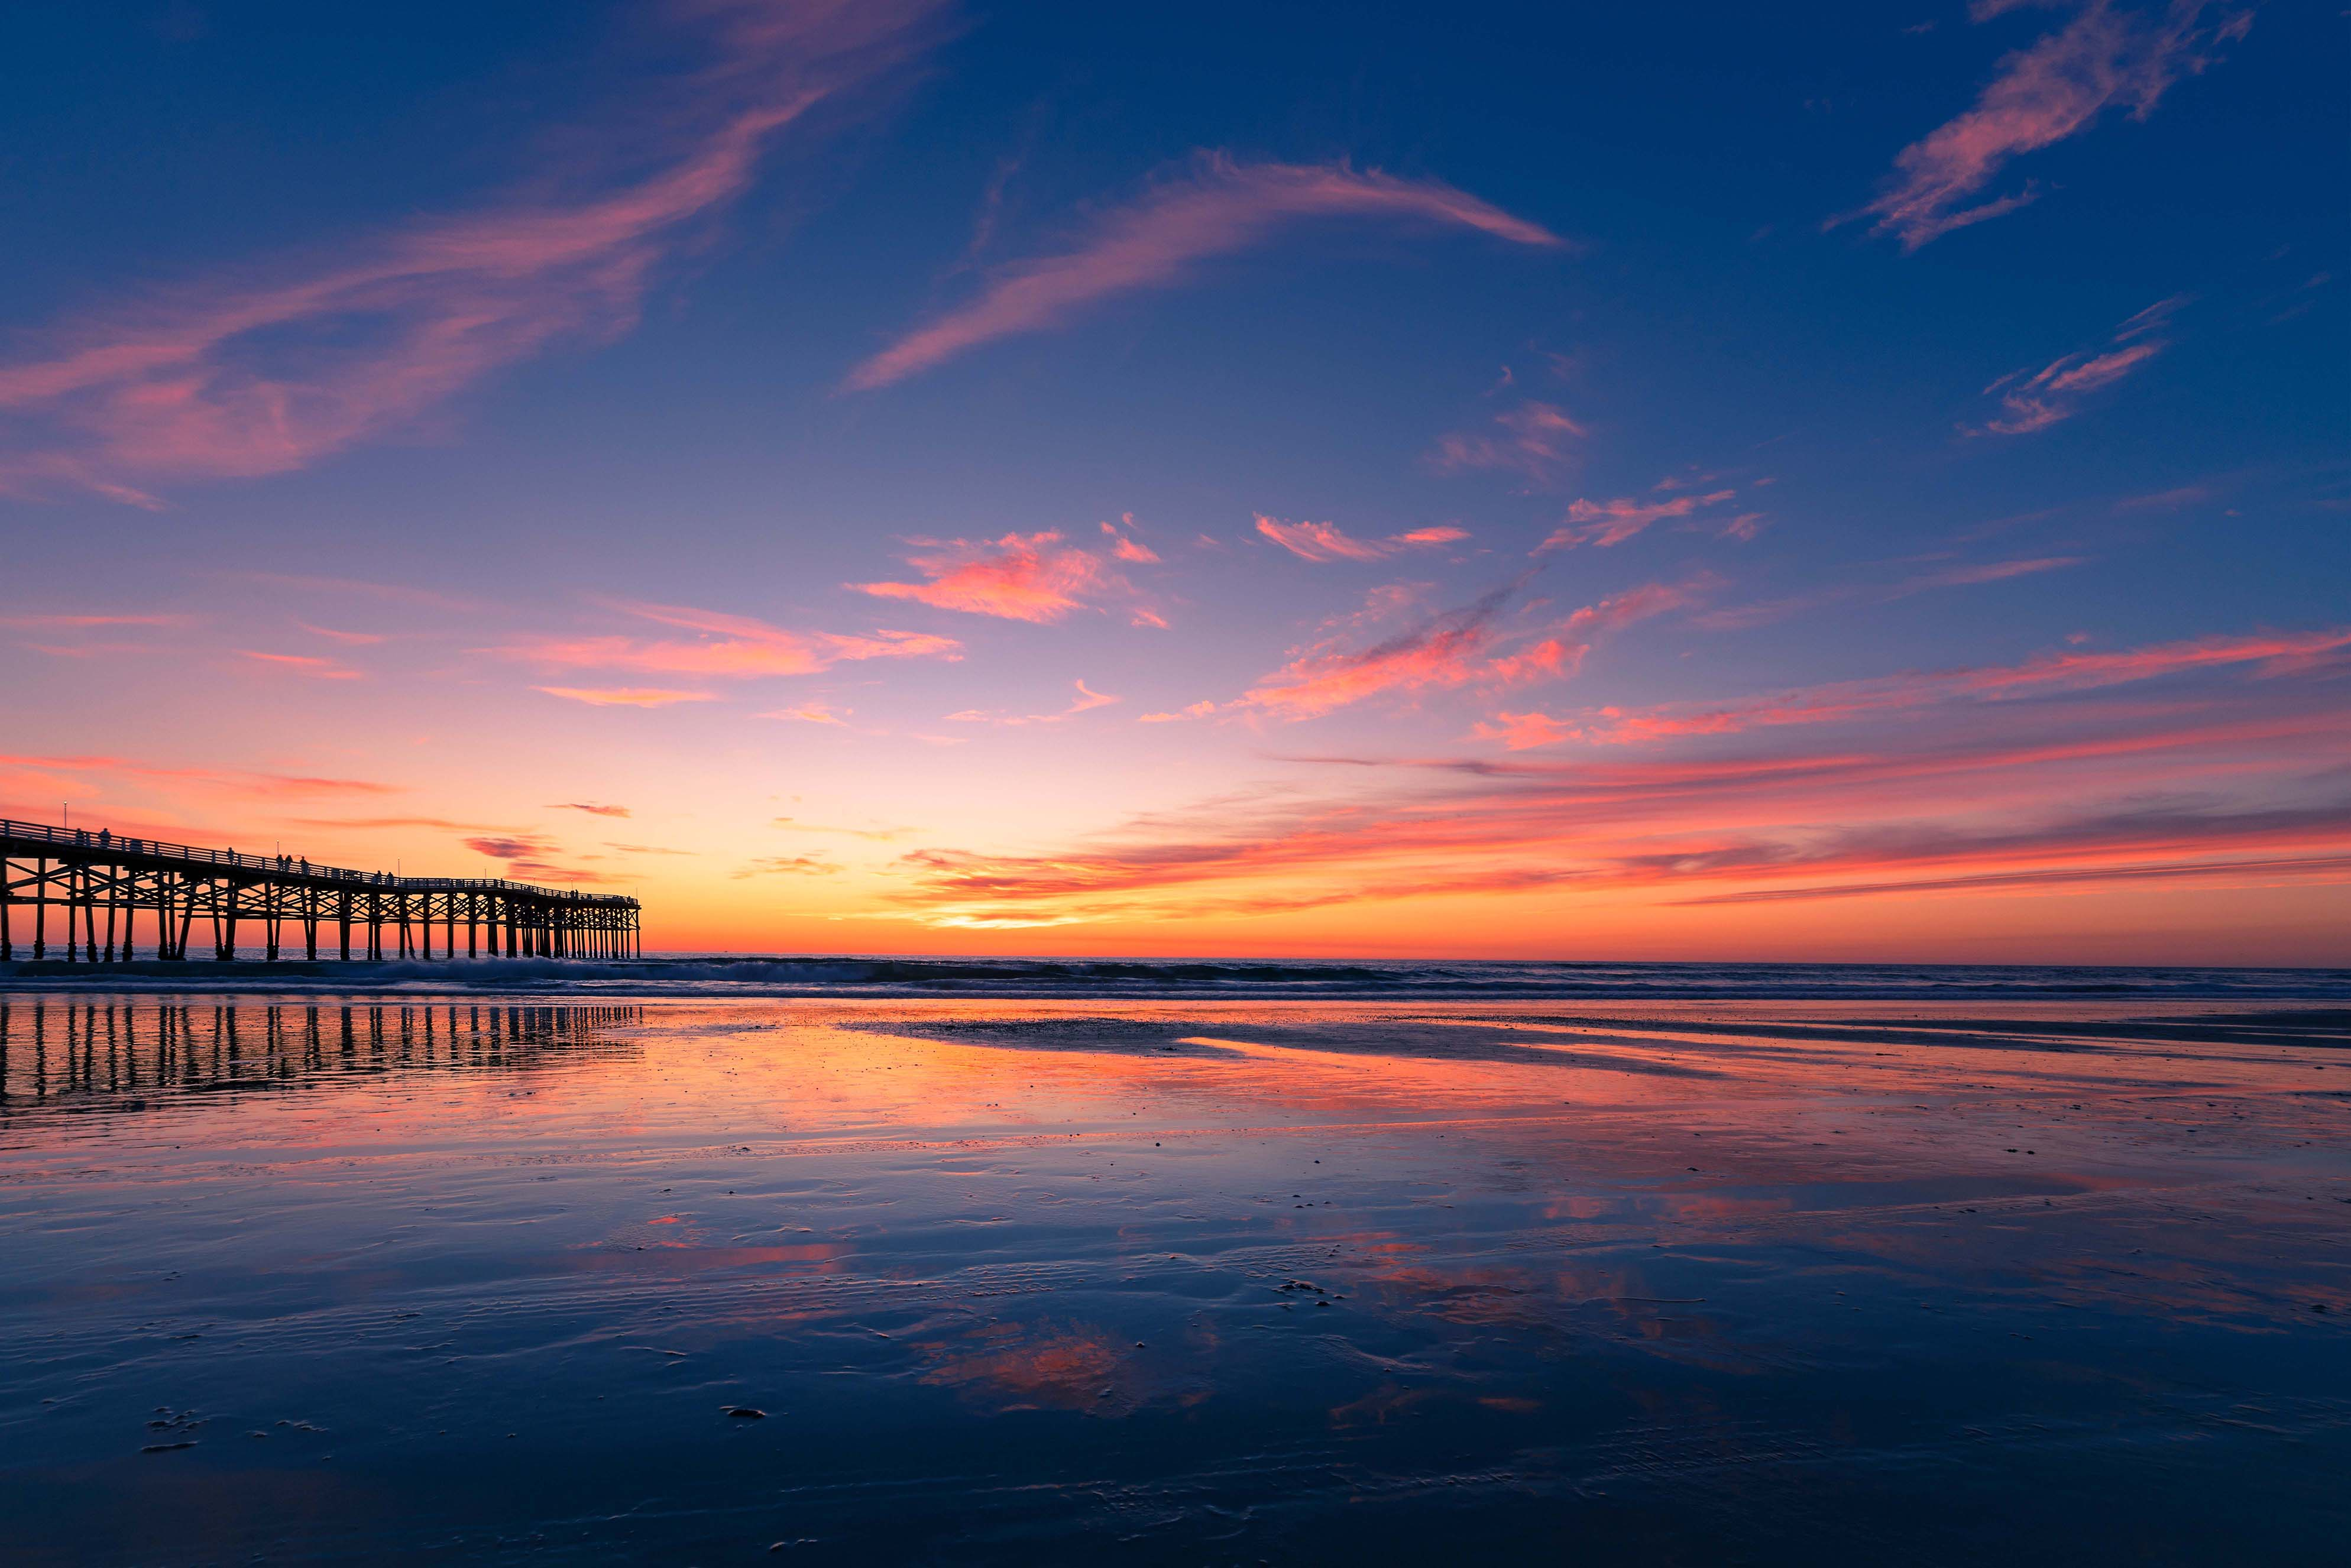 beach-sunset-california-LBVUDEX